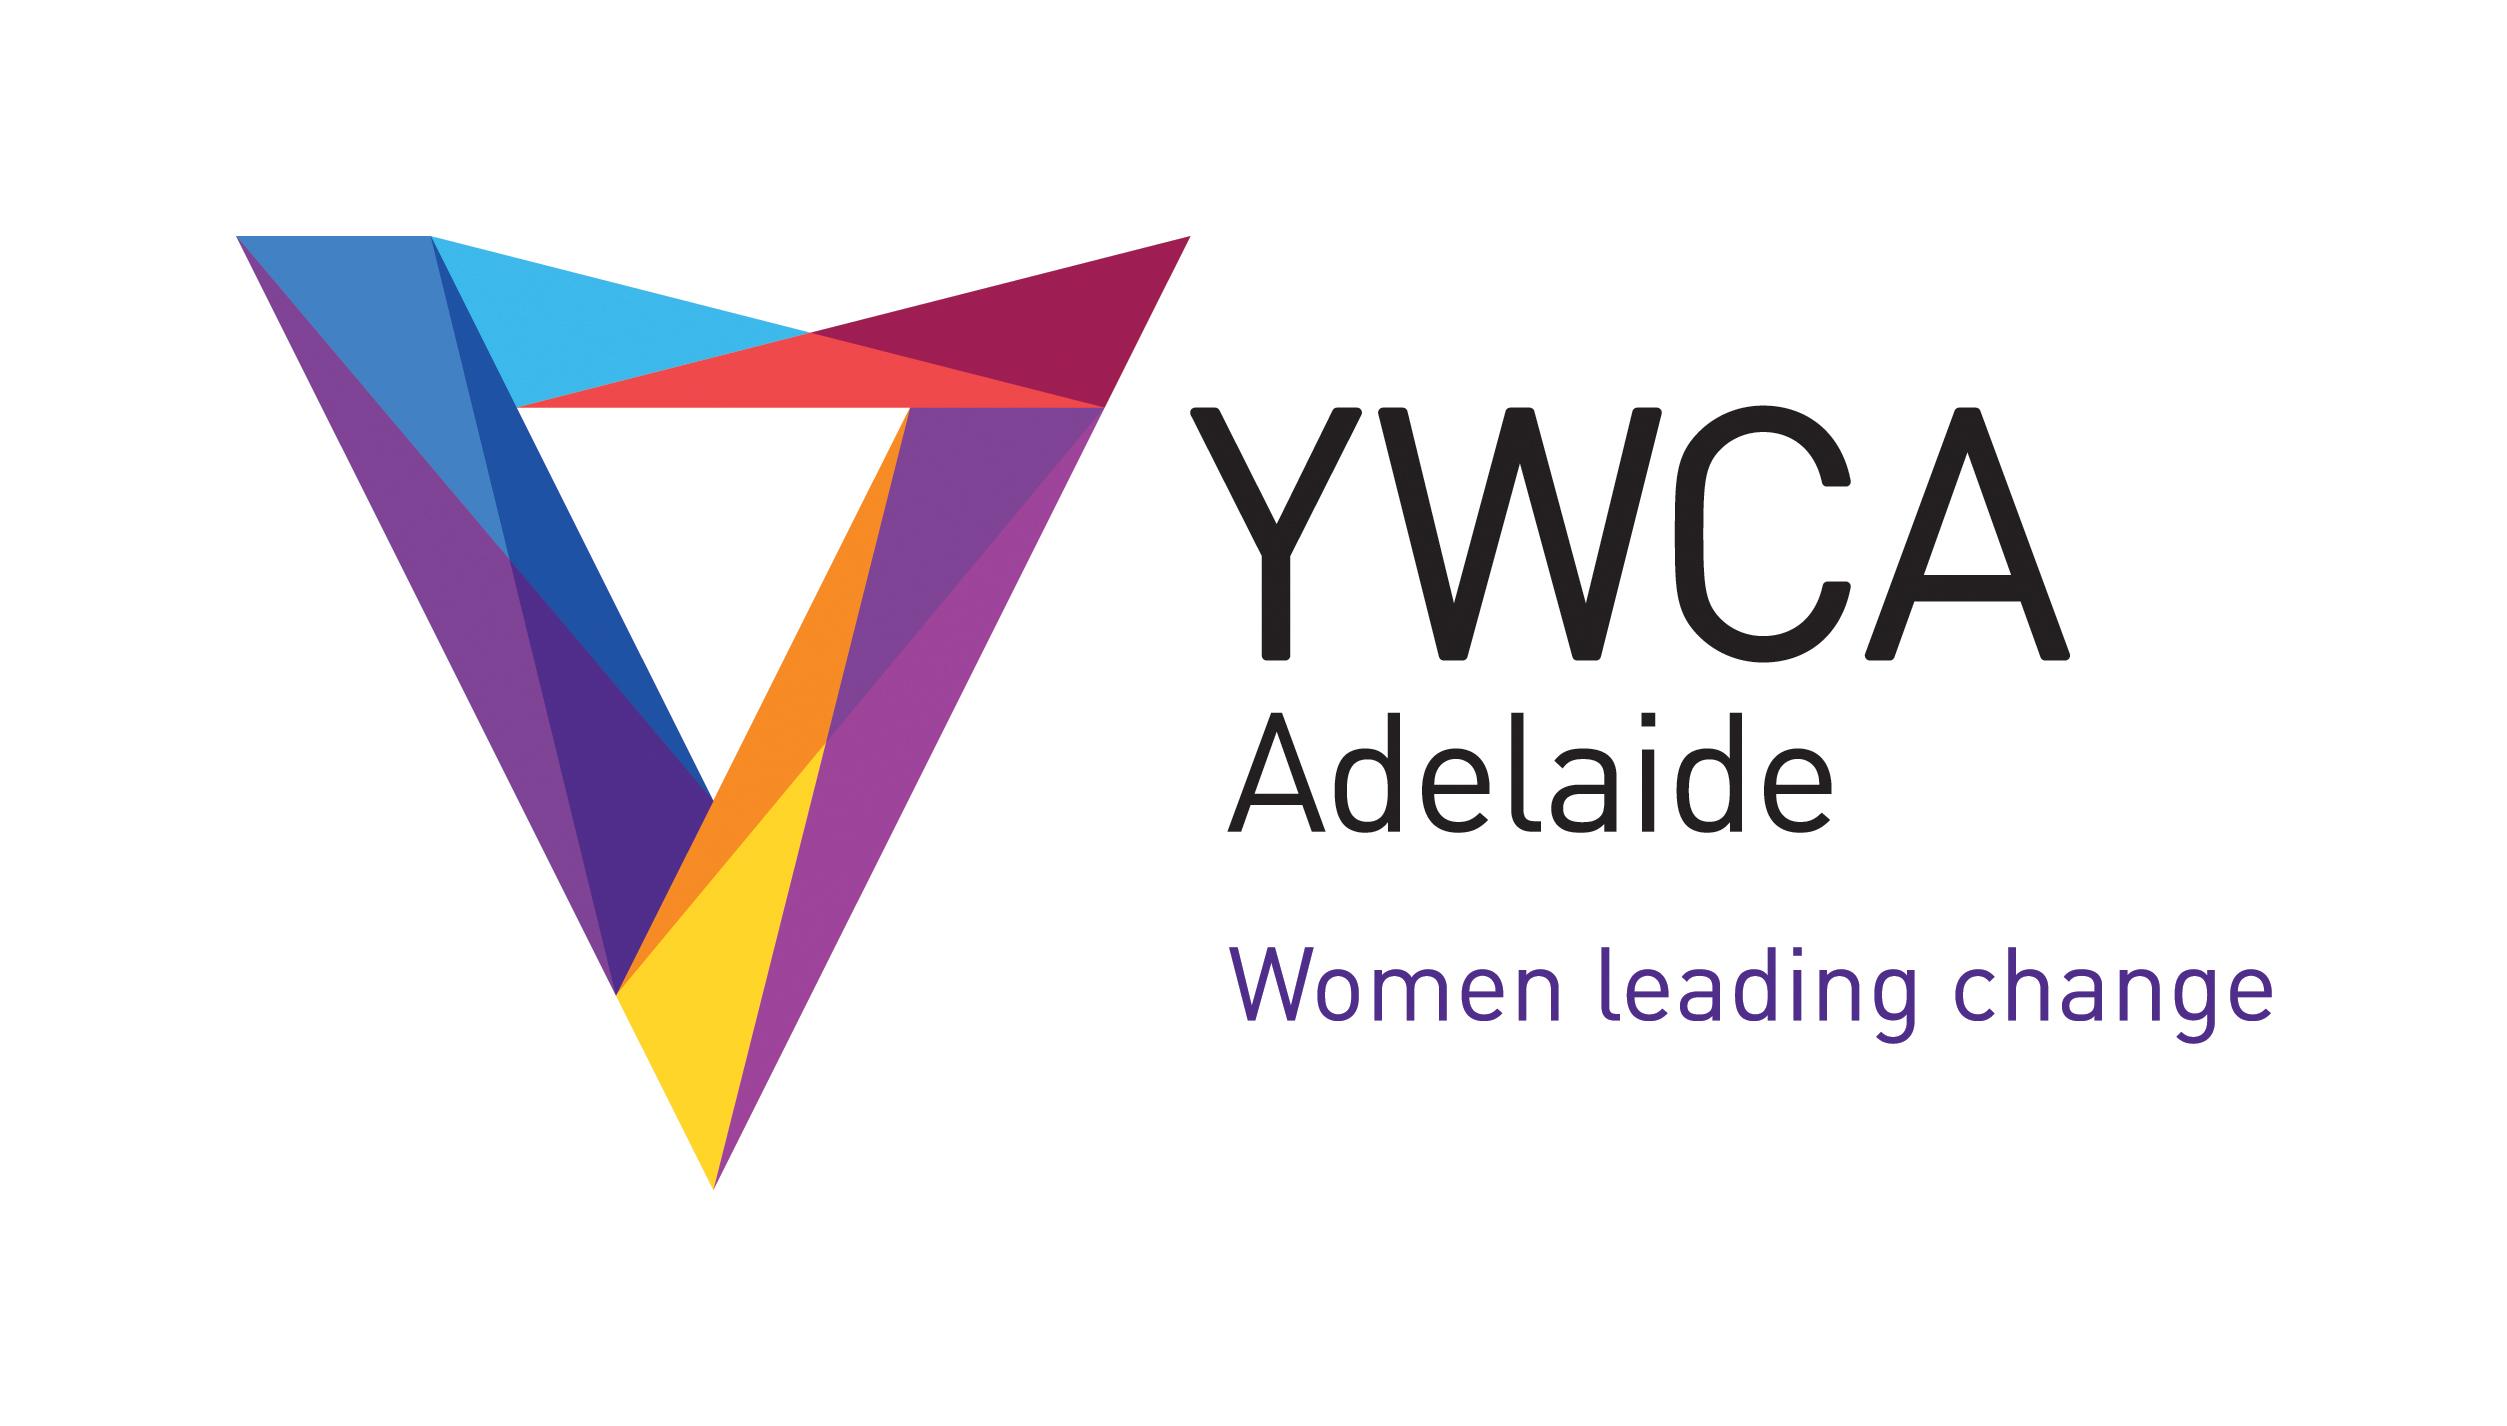 YWCA Adelaide